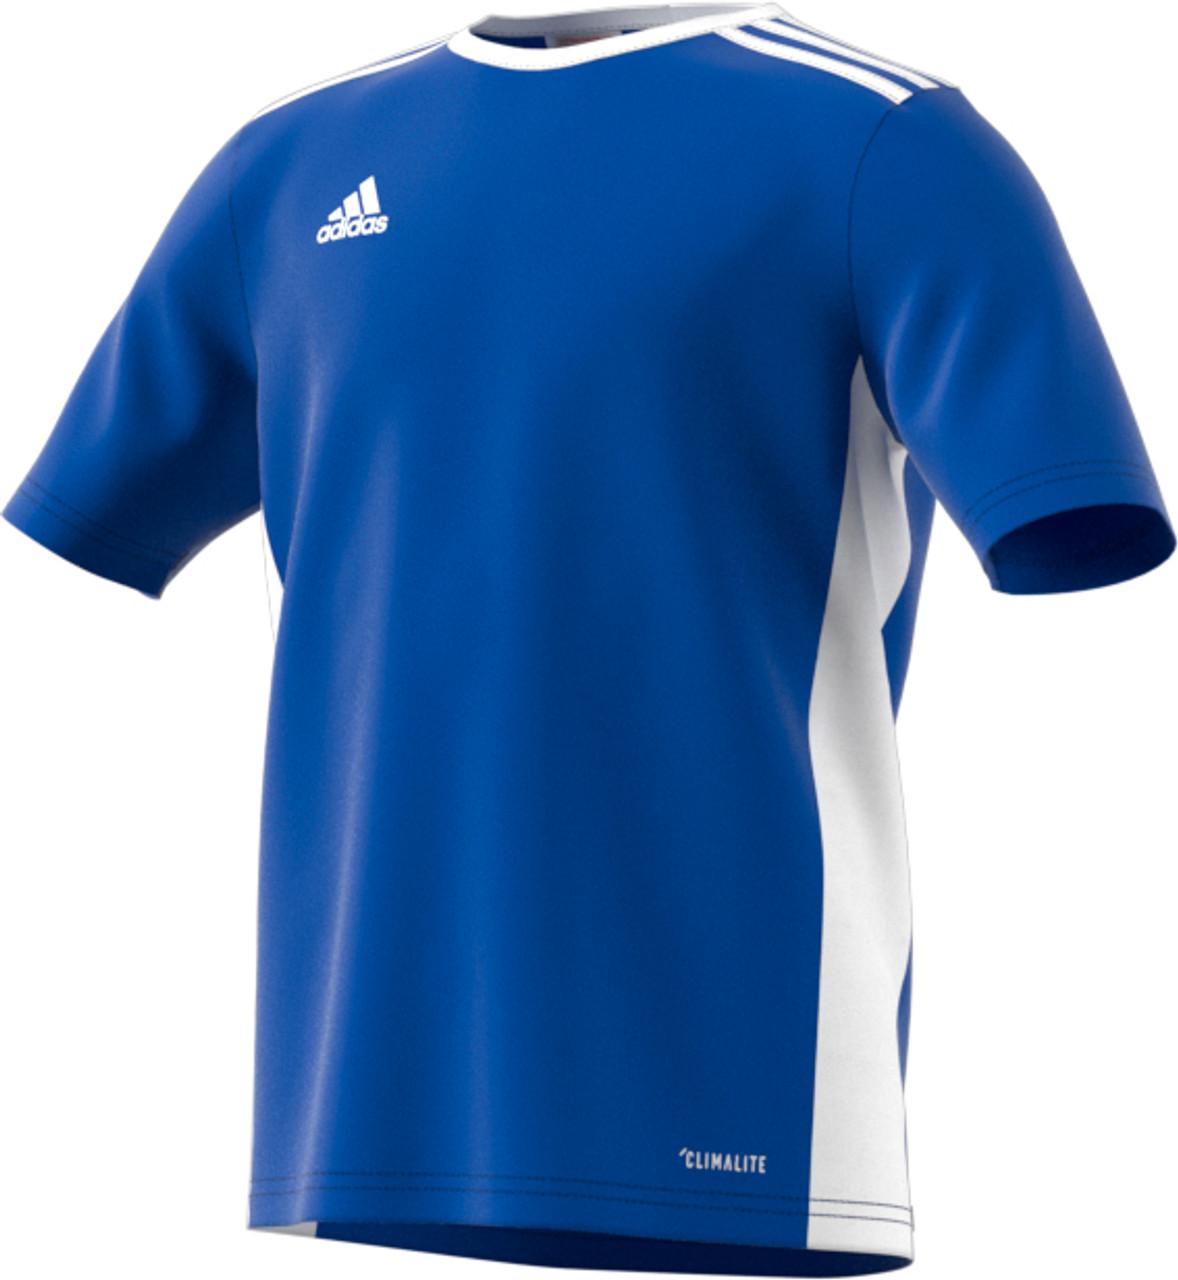 5b179320226 Adidas Entrada 18 Jersey  ADULT - DTI Sports